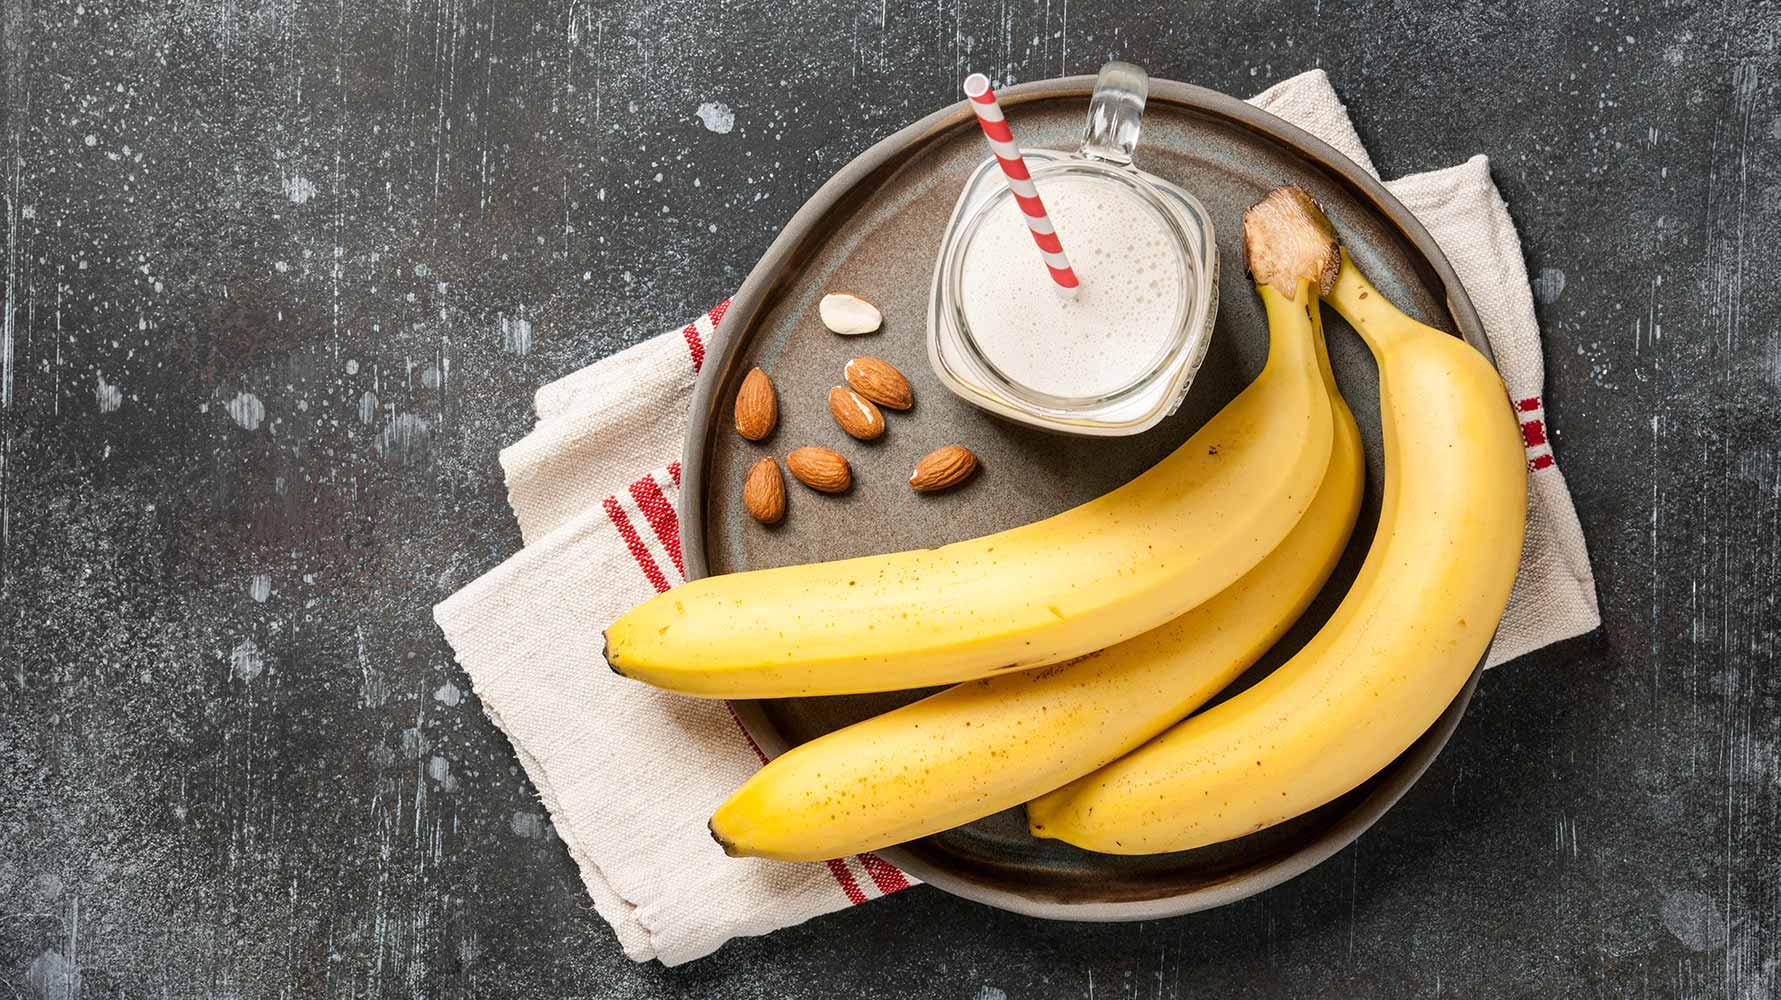 banana-smoothie-and-bananas